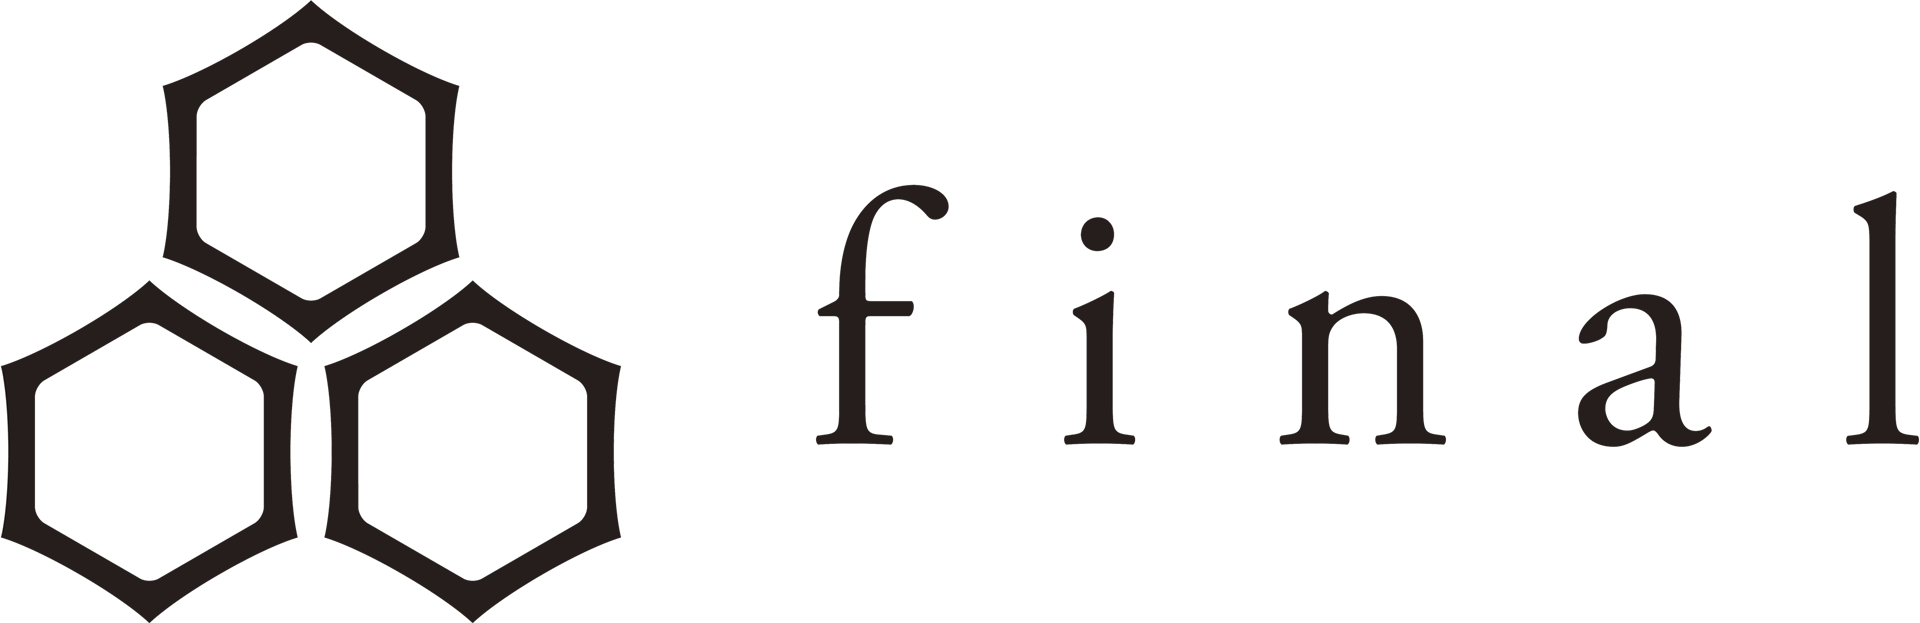 final_logo_small